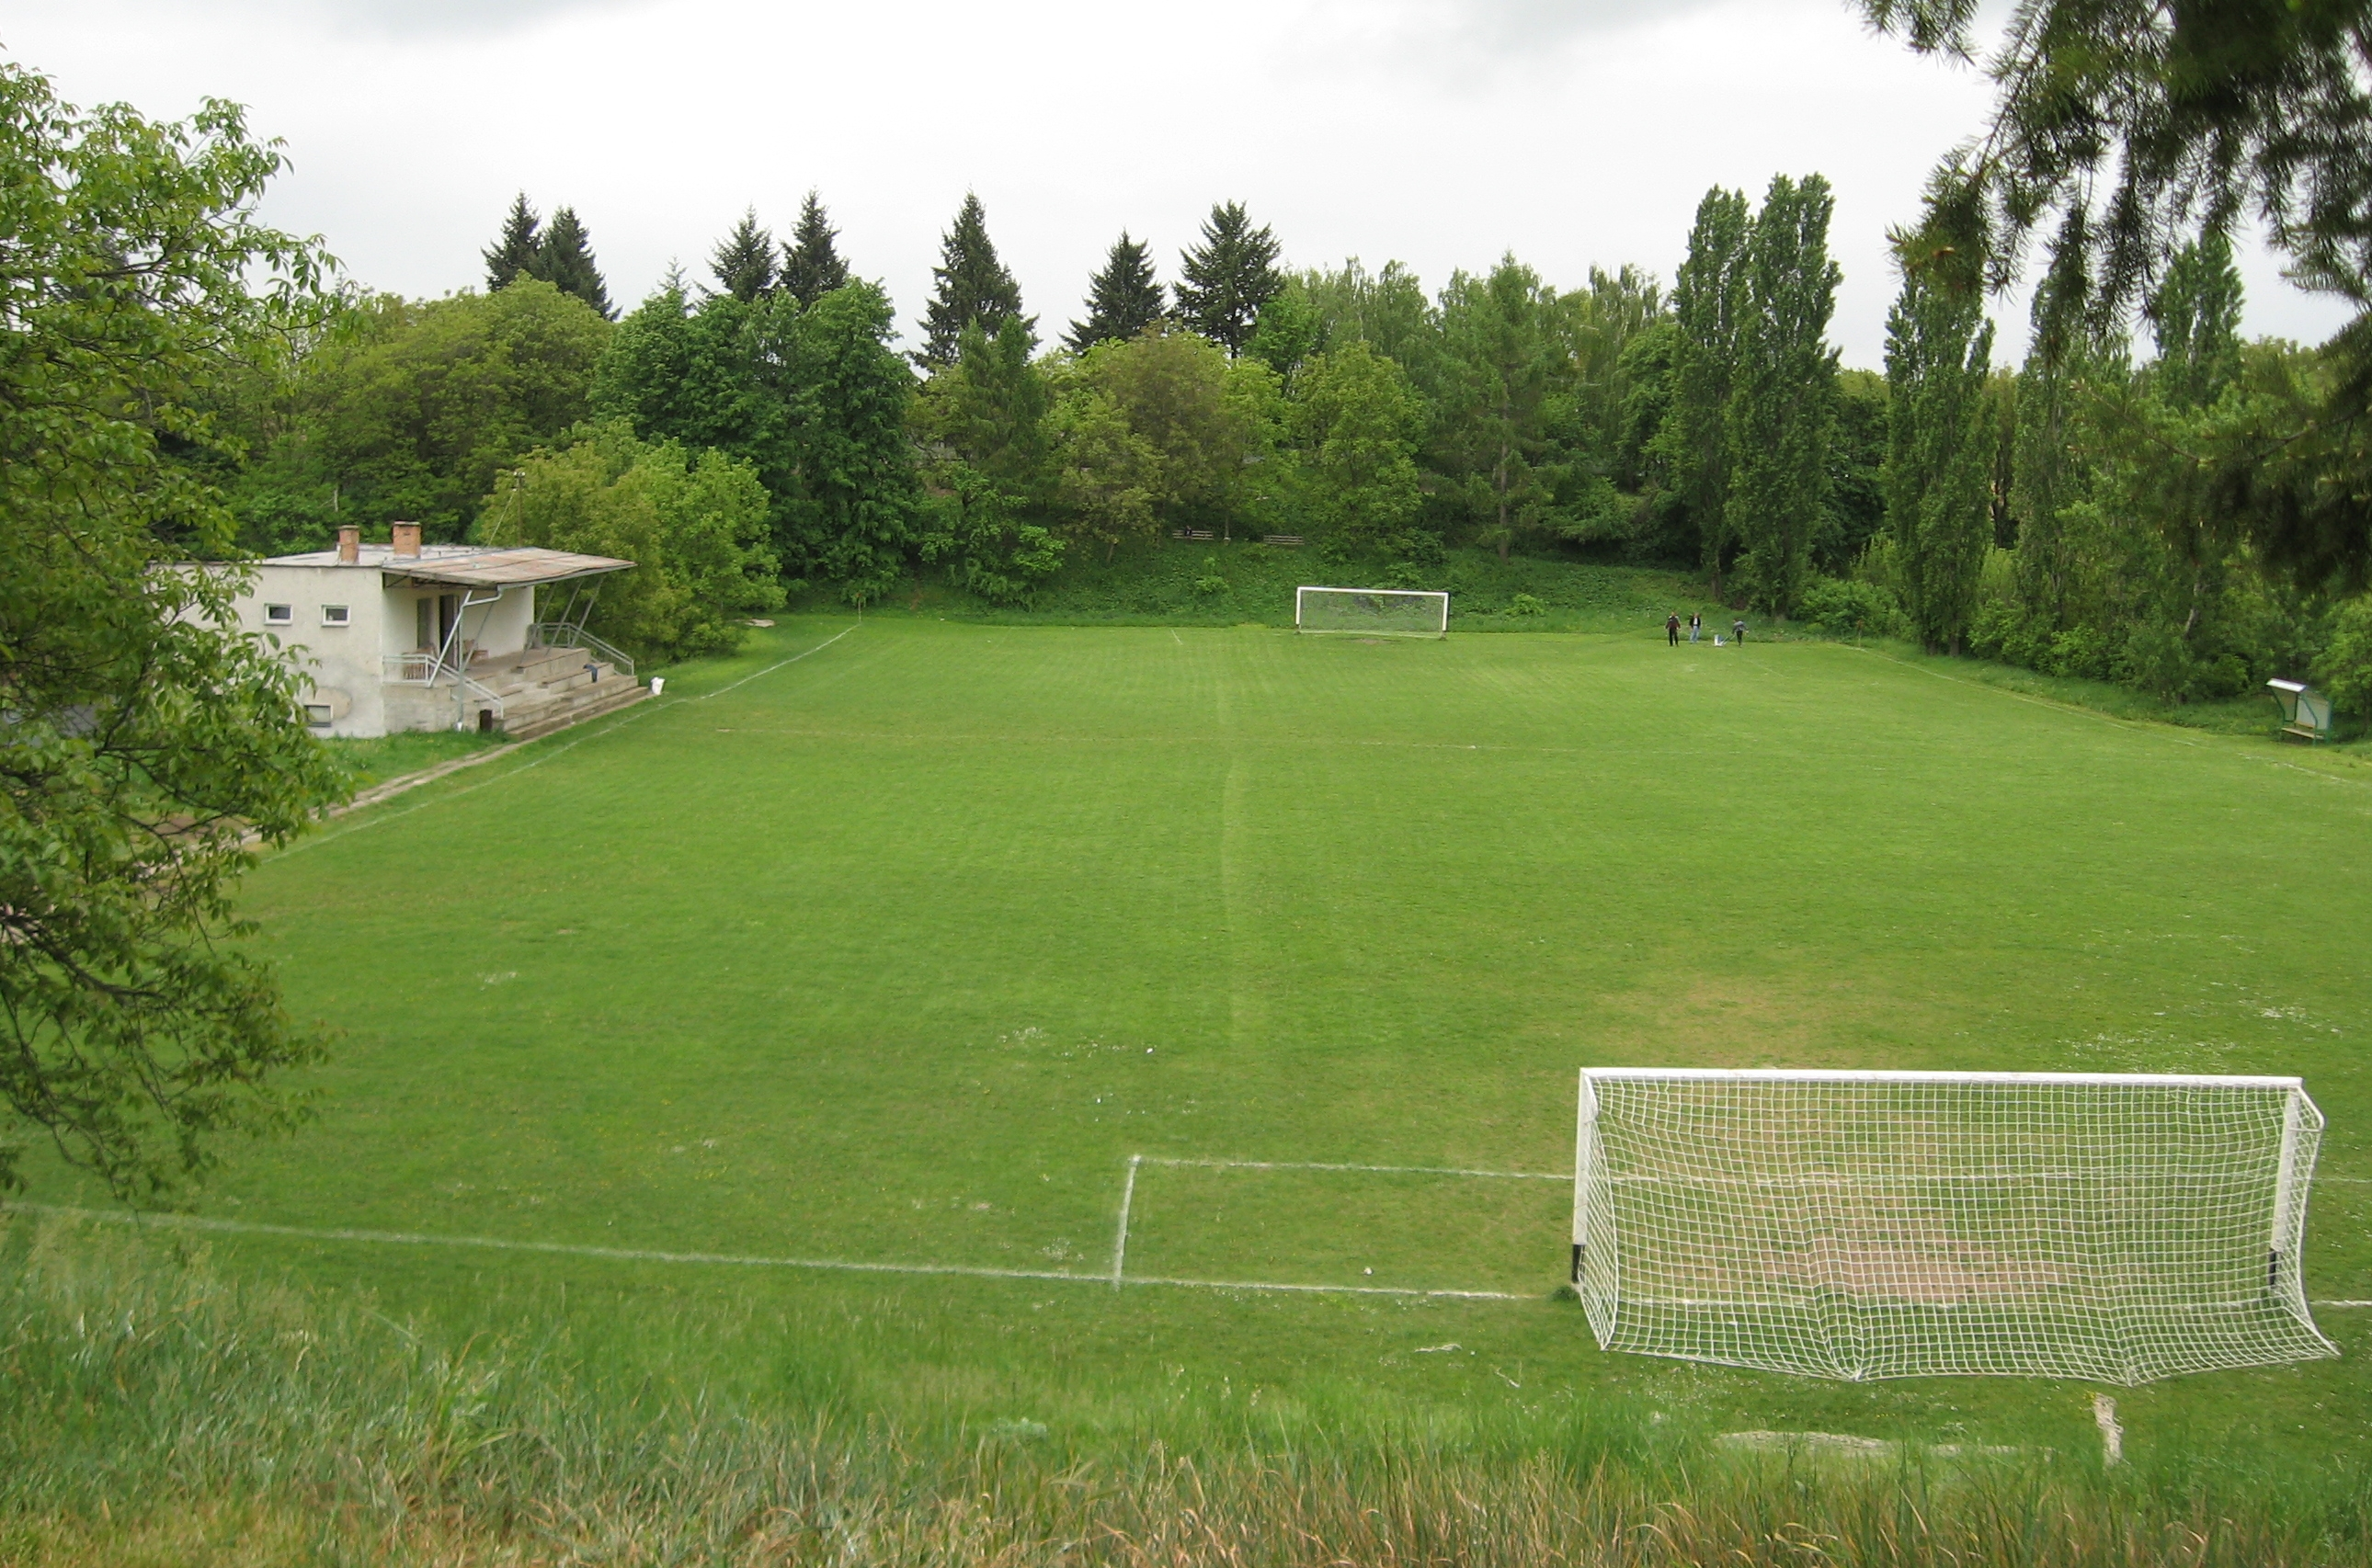 1be41ea0a File:Borovské futbalové ihrisko v zajatí zelene - panoramio.jpg ...